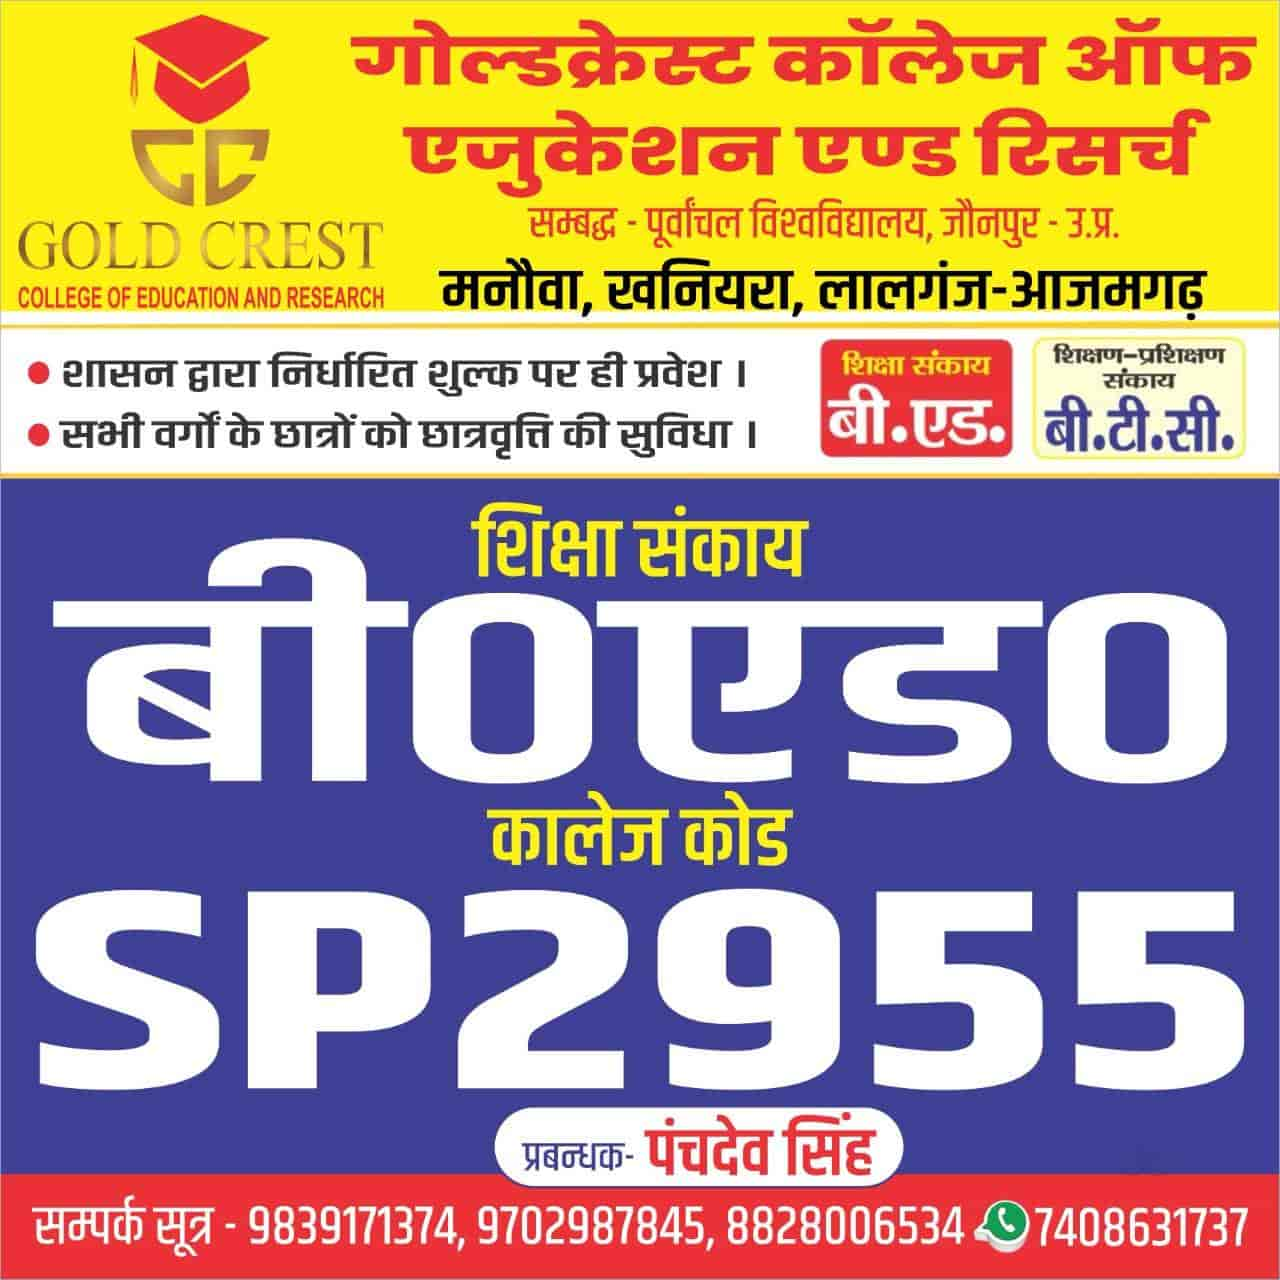 elenco college di azamgarh btc)